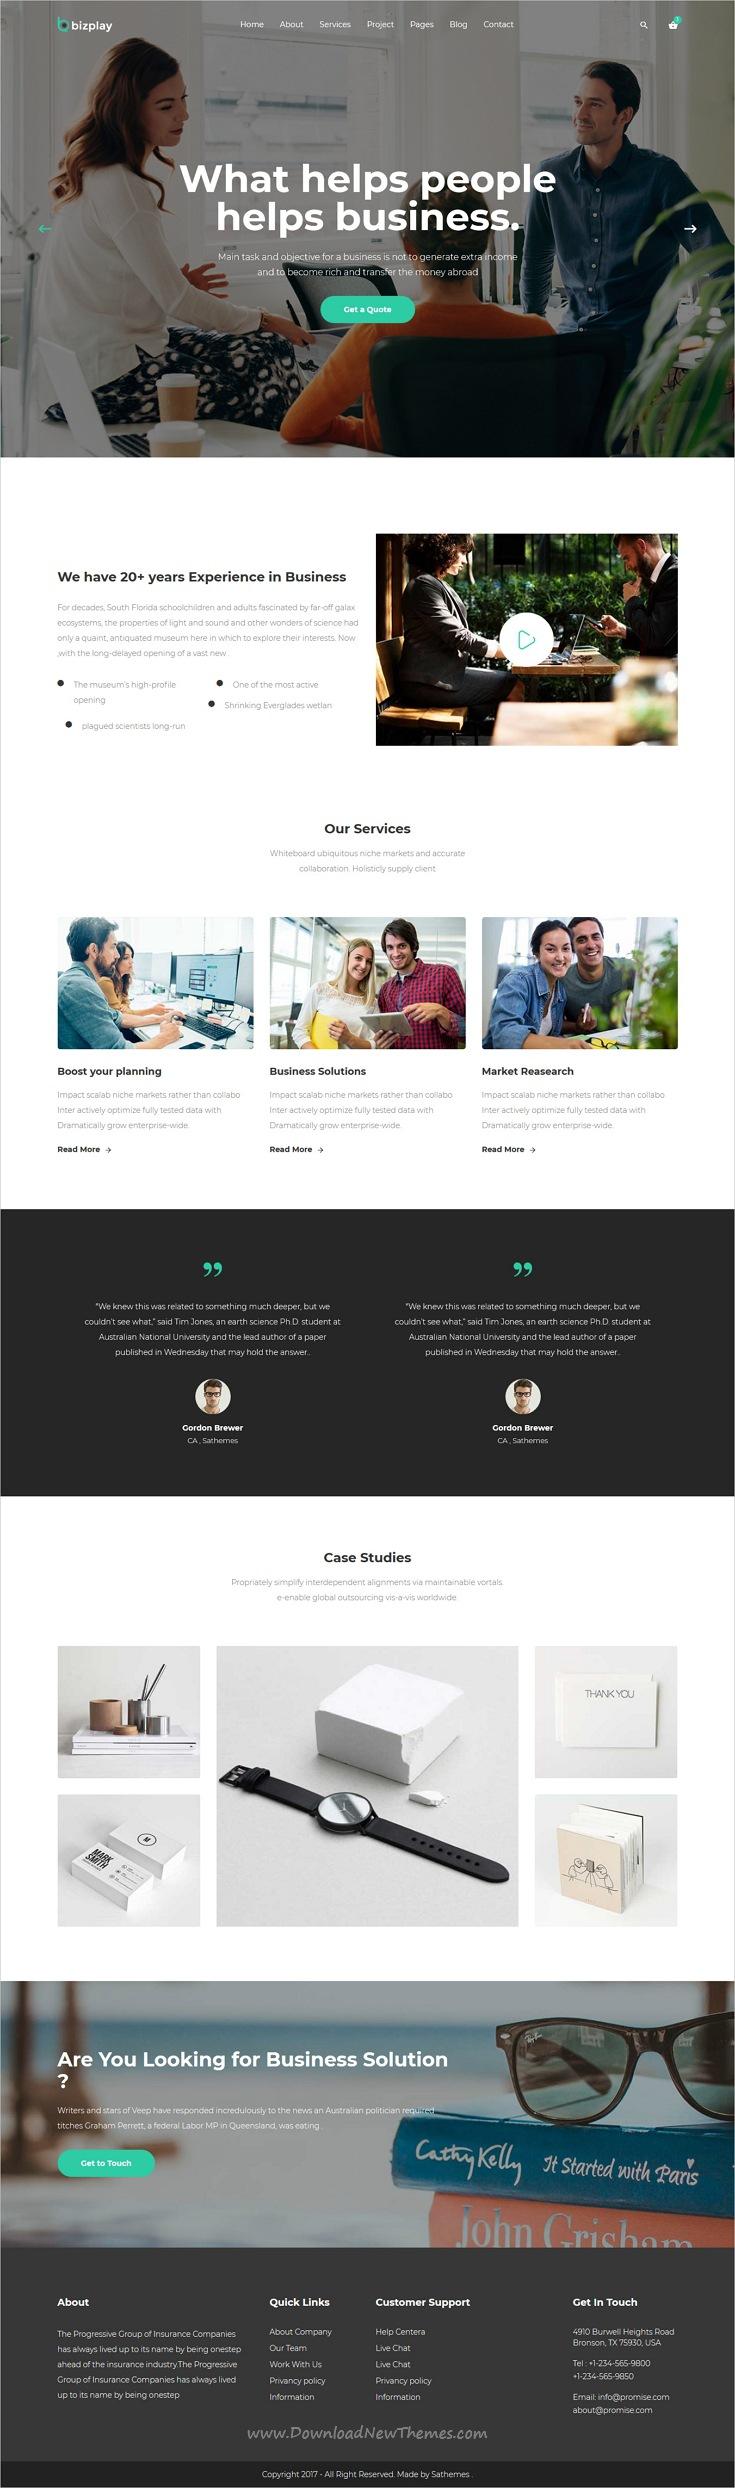 Bizplay - Business, Consultation & Finance Multipurpose Template ...